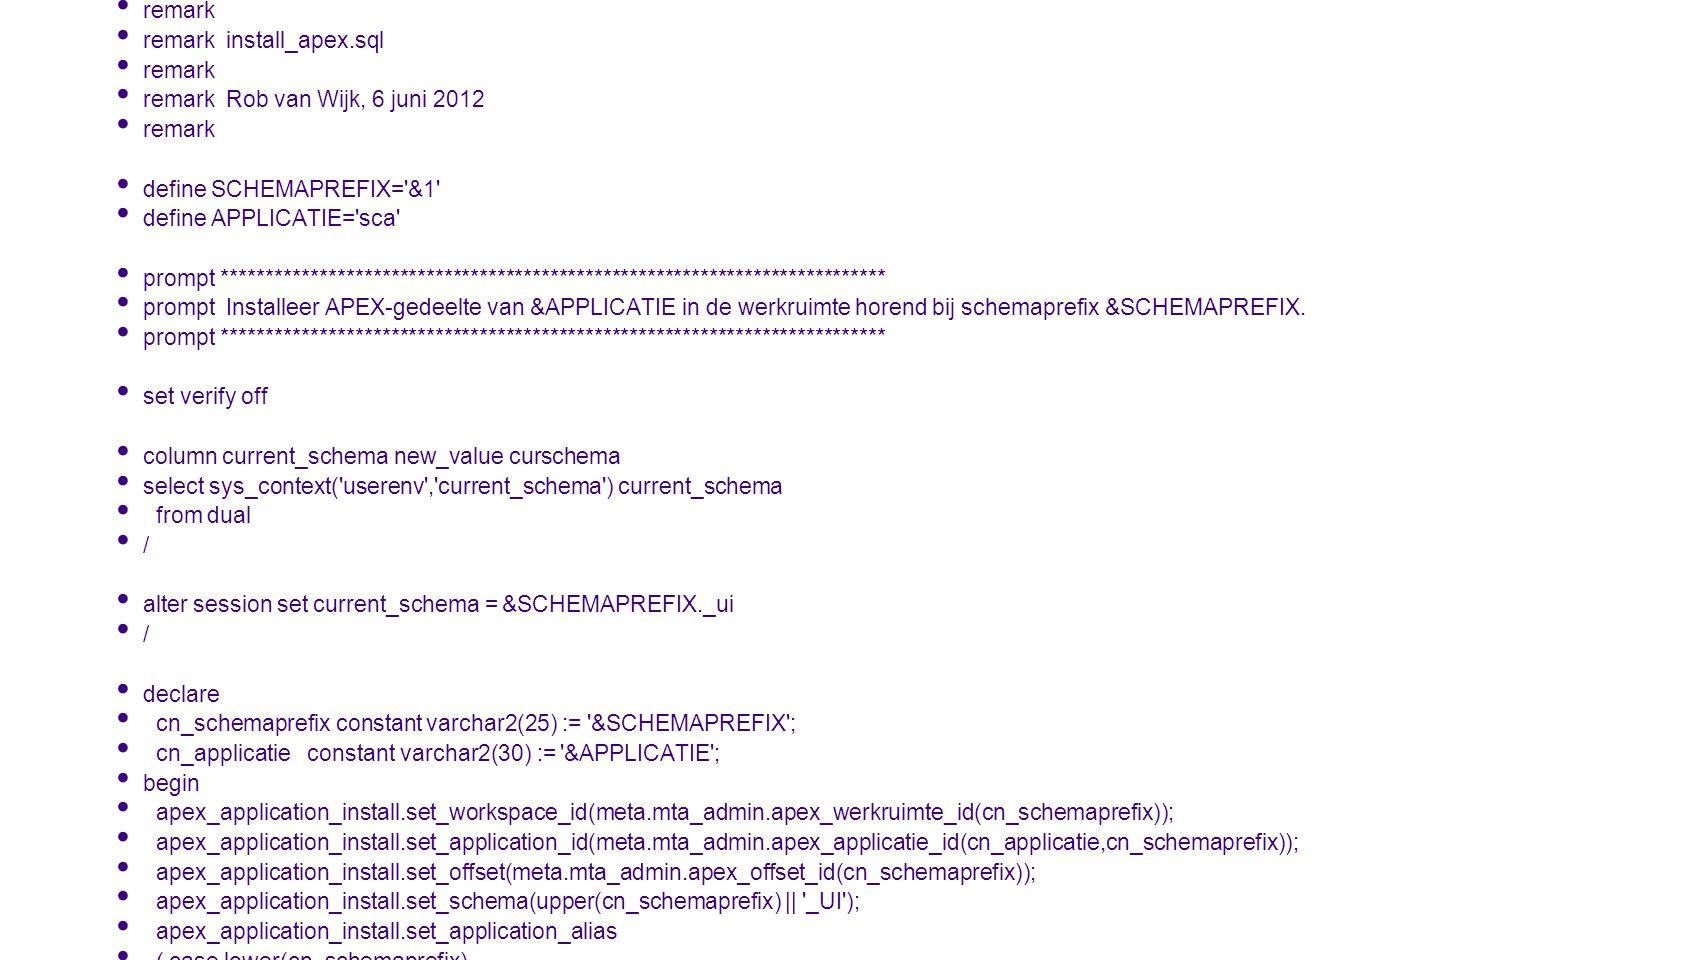 remark remark install_apex.sql. remark Rob van Wijk, 6 juni 2012. define SCHEMAPREFIX= &1 define APPLICATIE= sca